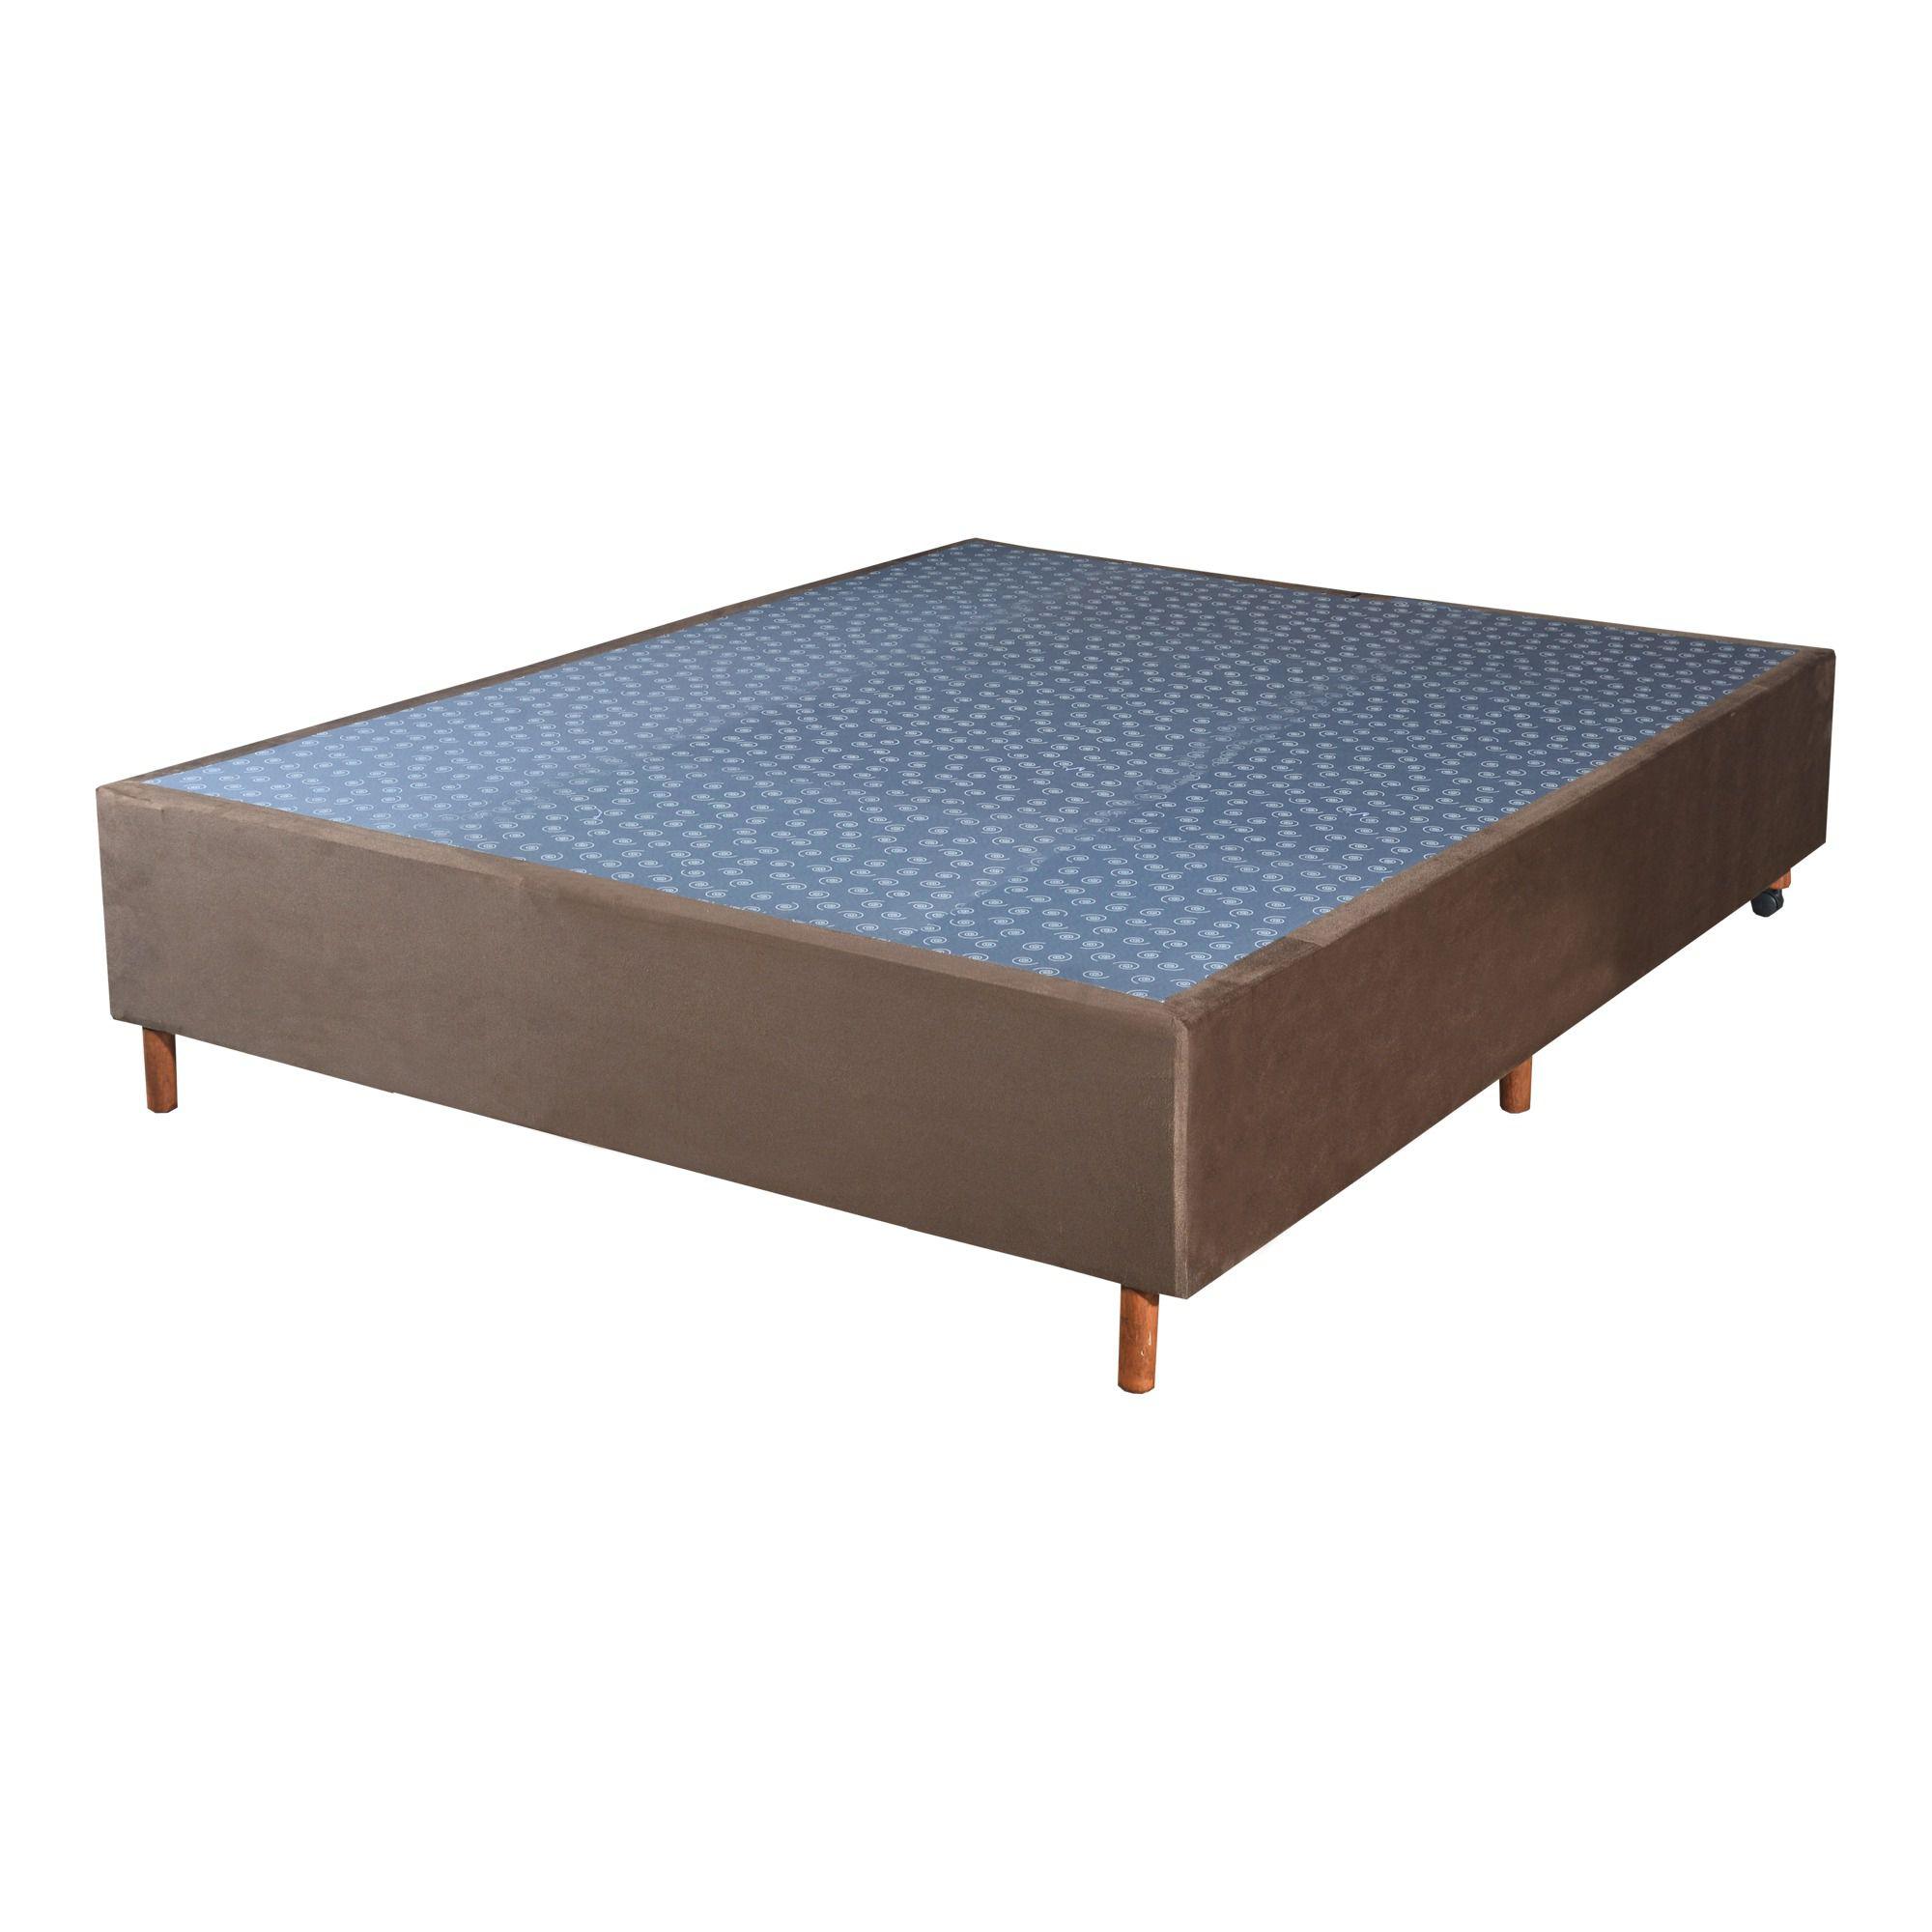 Cama Box Base Casal Veludo Marron 138x188x30